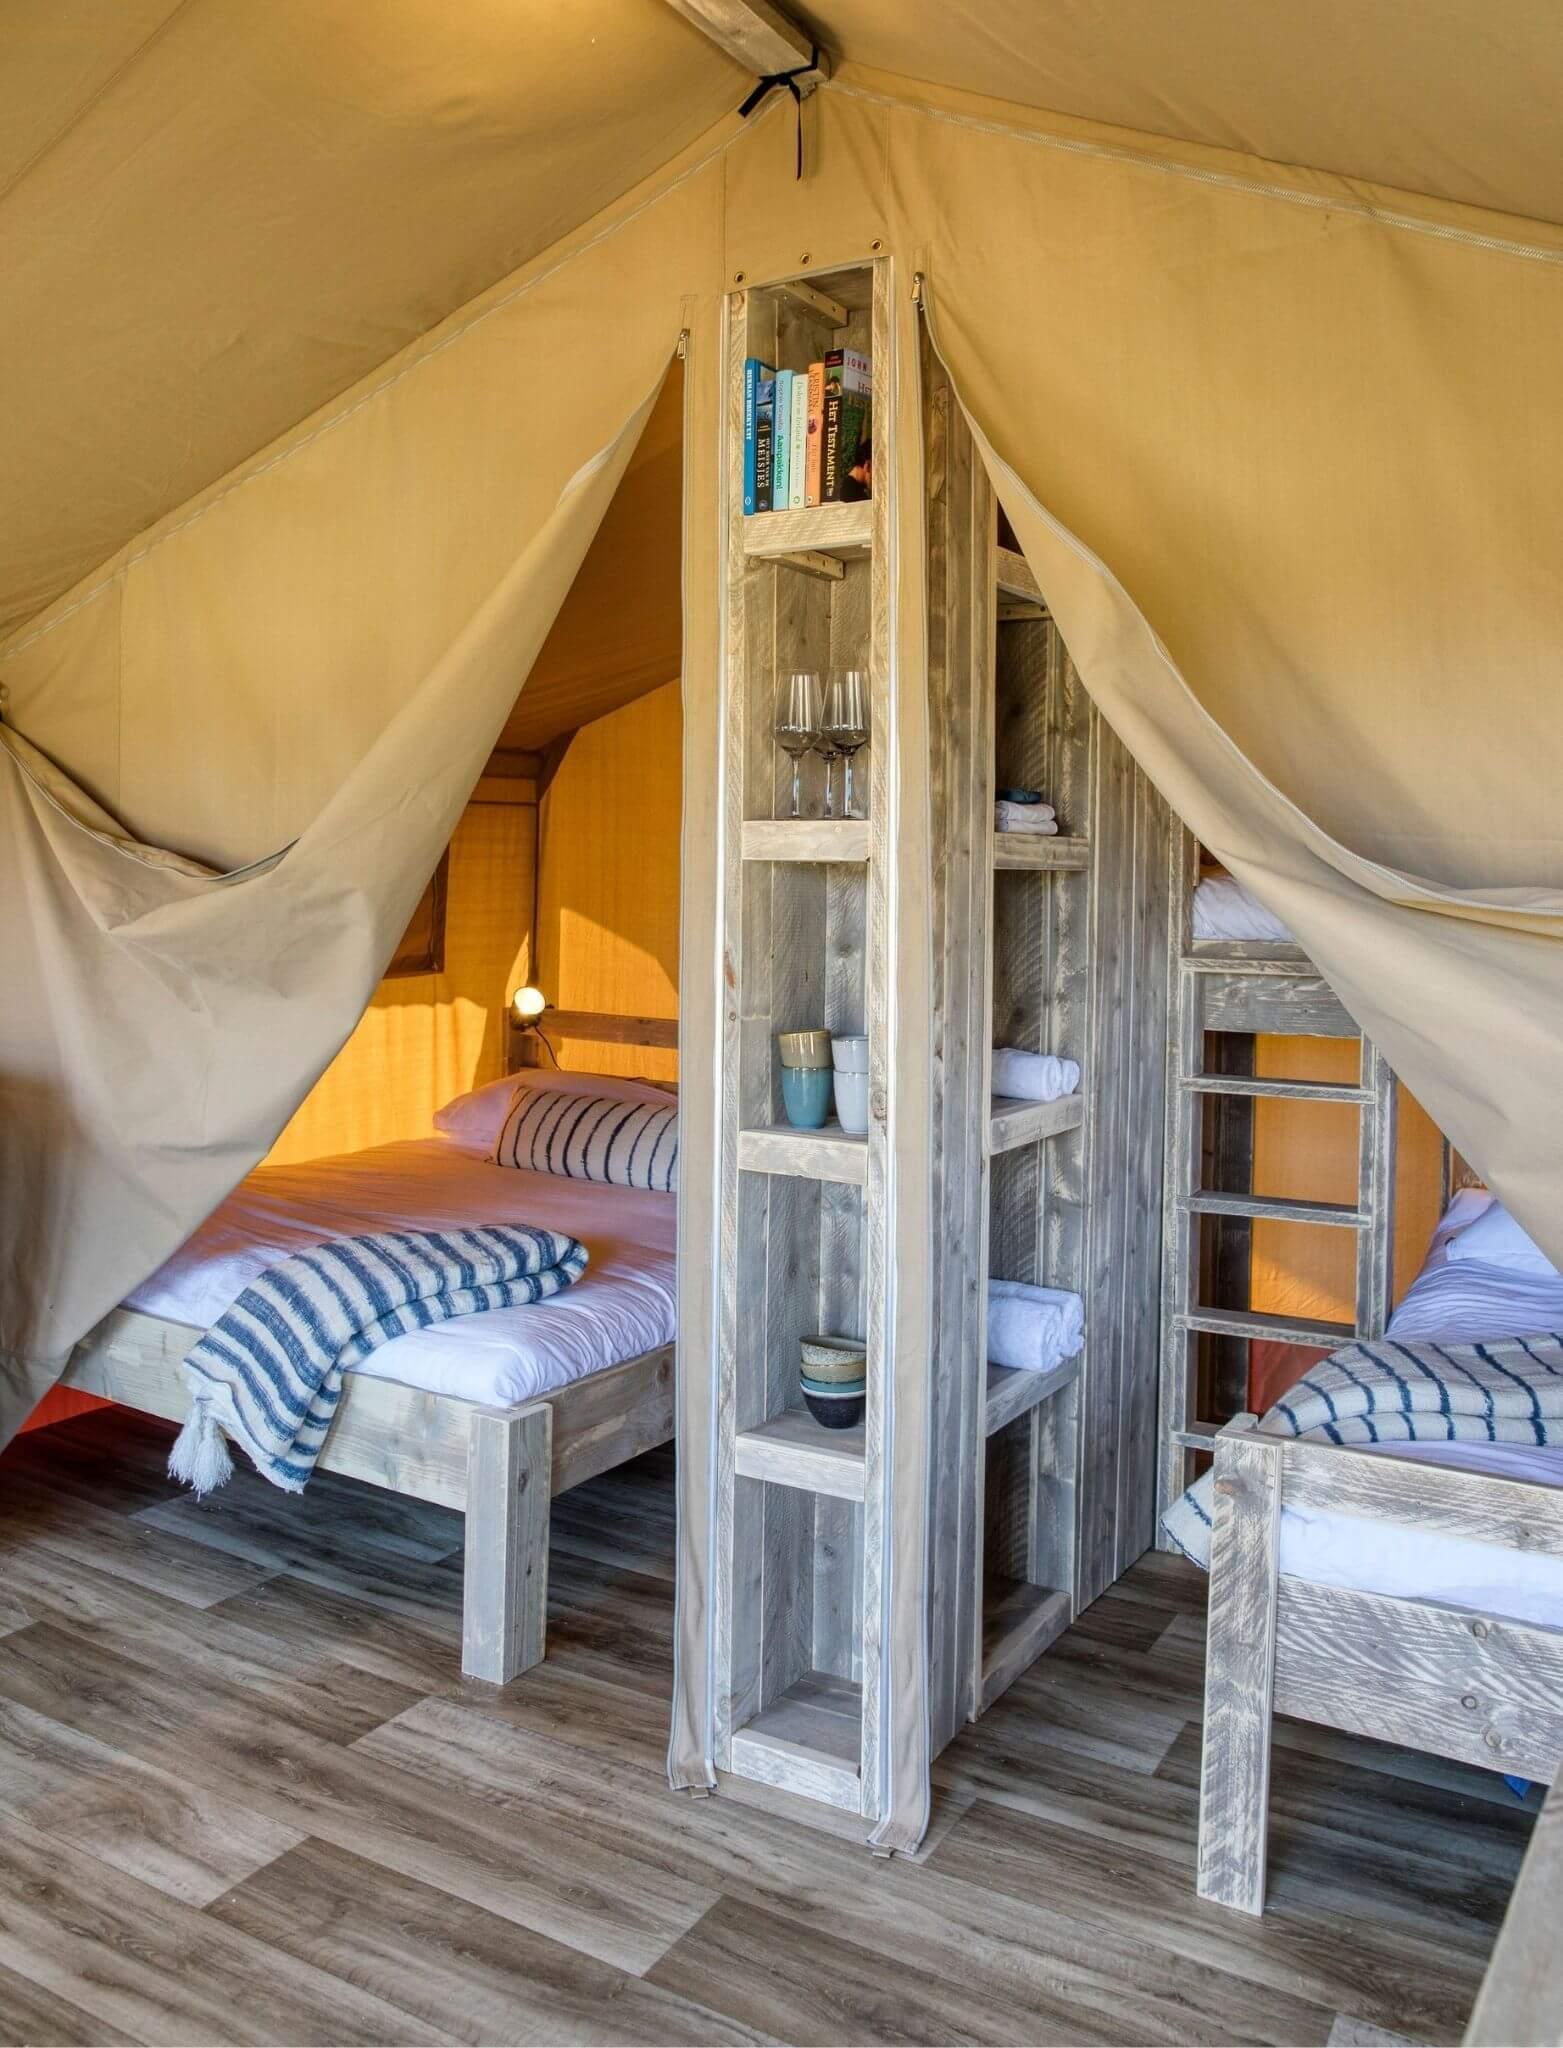 YALA_interior_Raw_interior_bedrooms